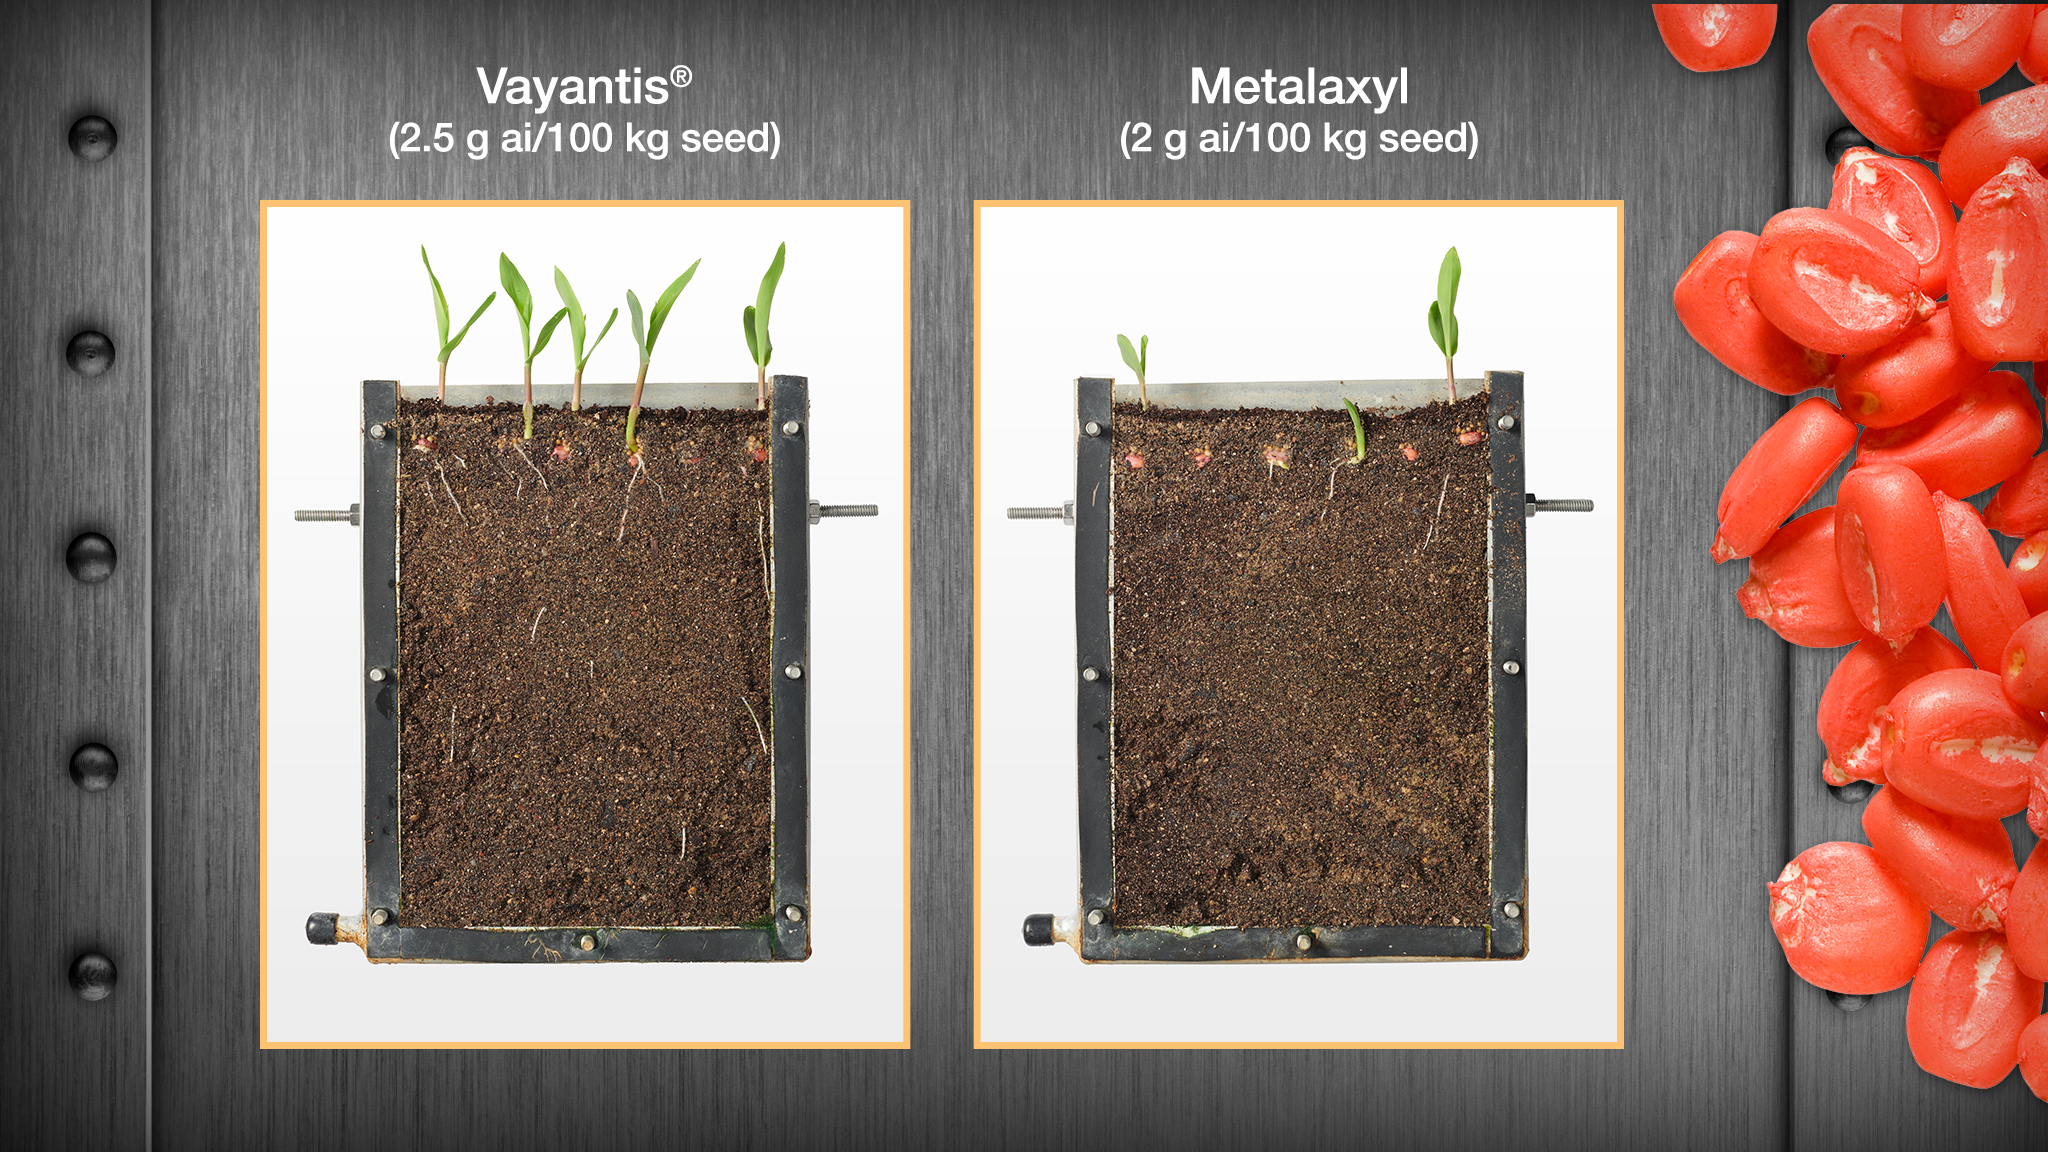 Comparison between corn seedlings from Syngenta trials in Stanton, MN, 2020